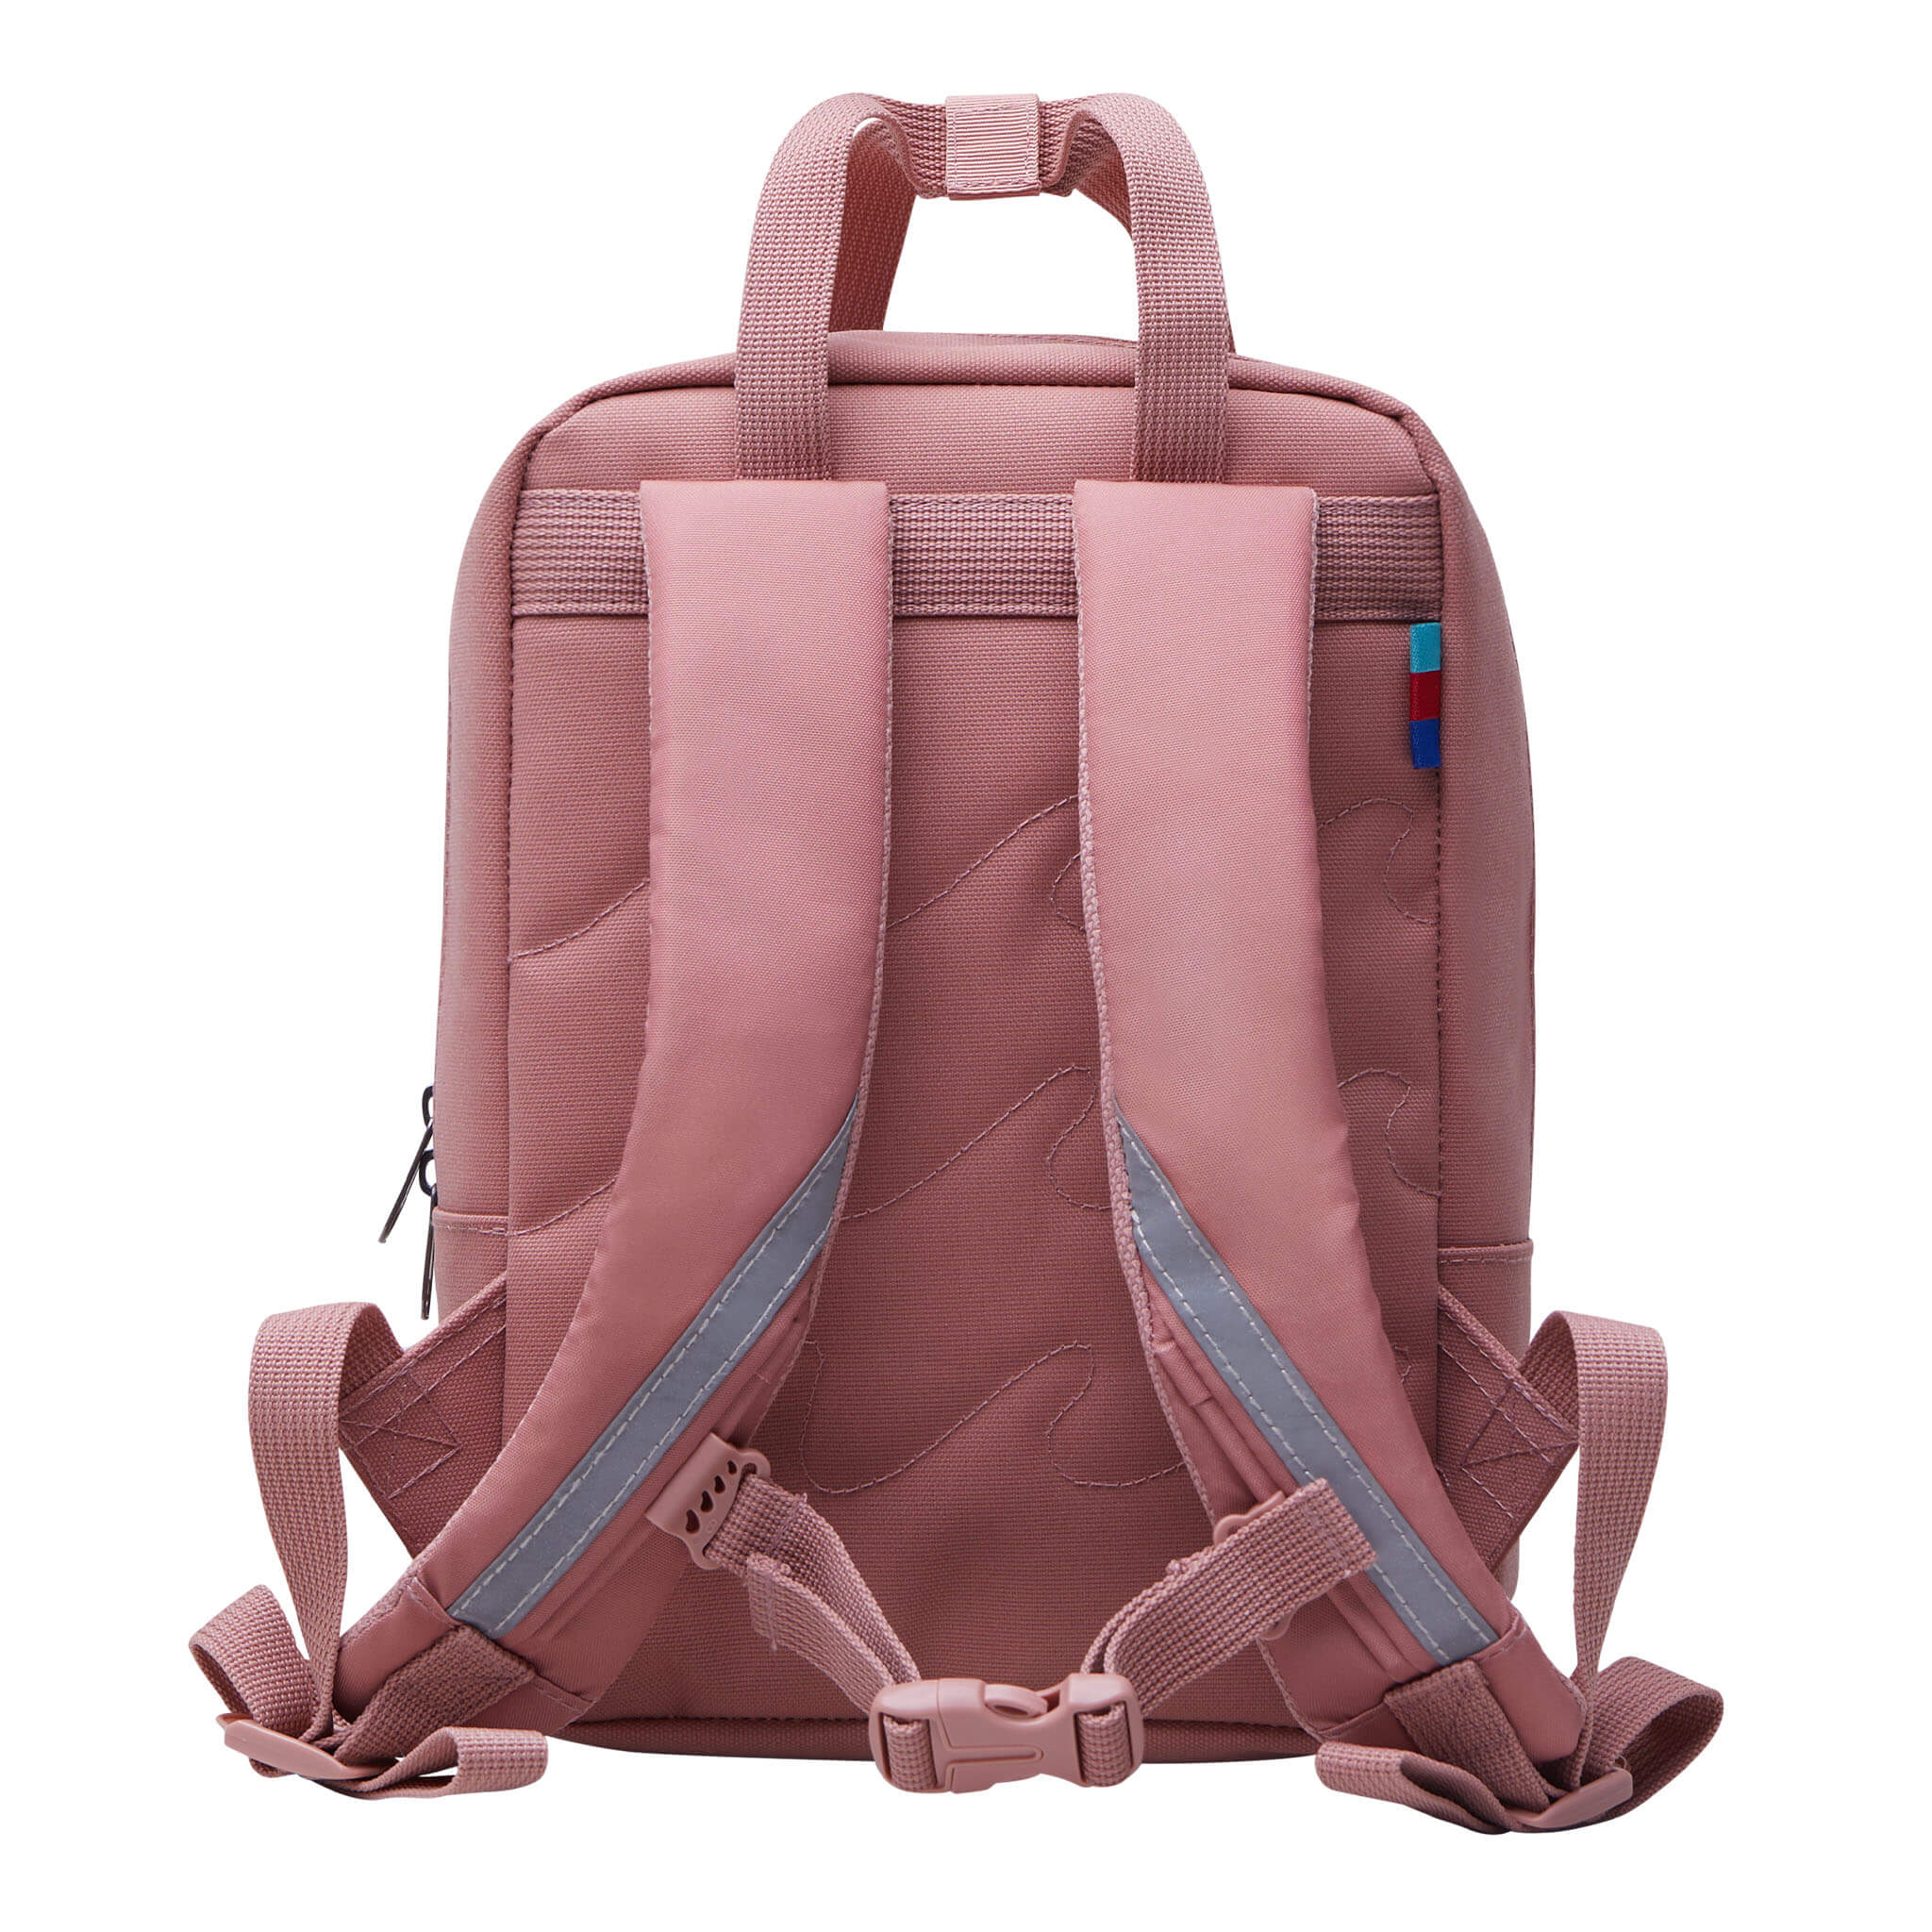 Got Bag Kids Collection- Daypack Mini - 5 Liter - Rose Pearl